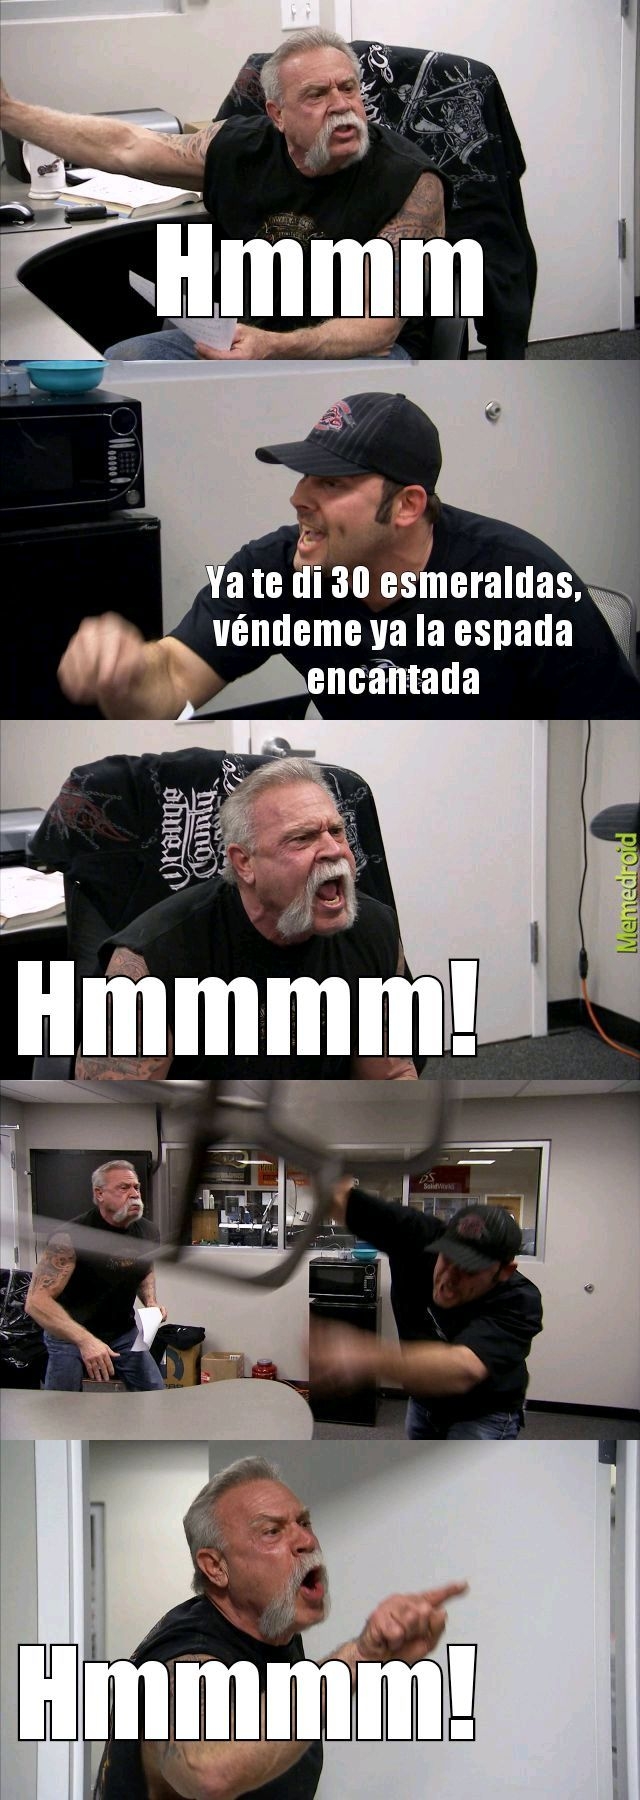 Aldeanos timadores - meme